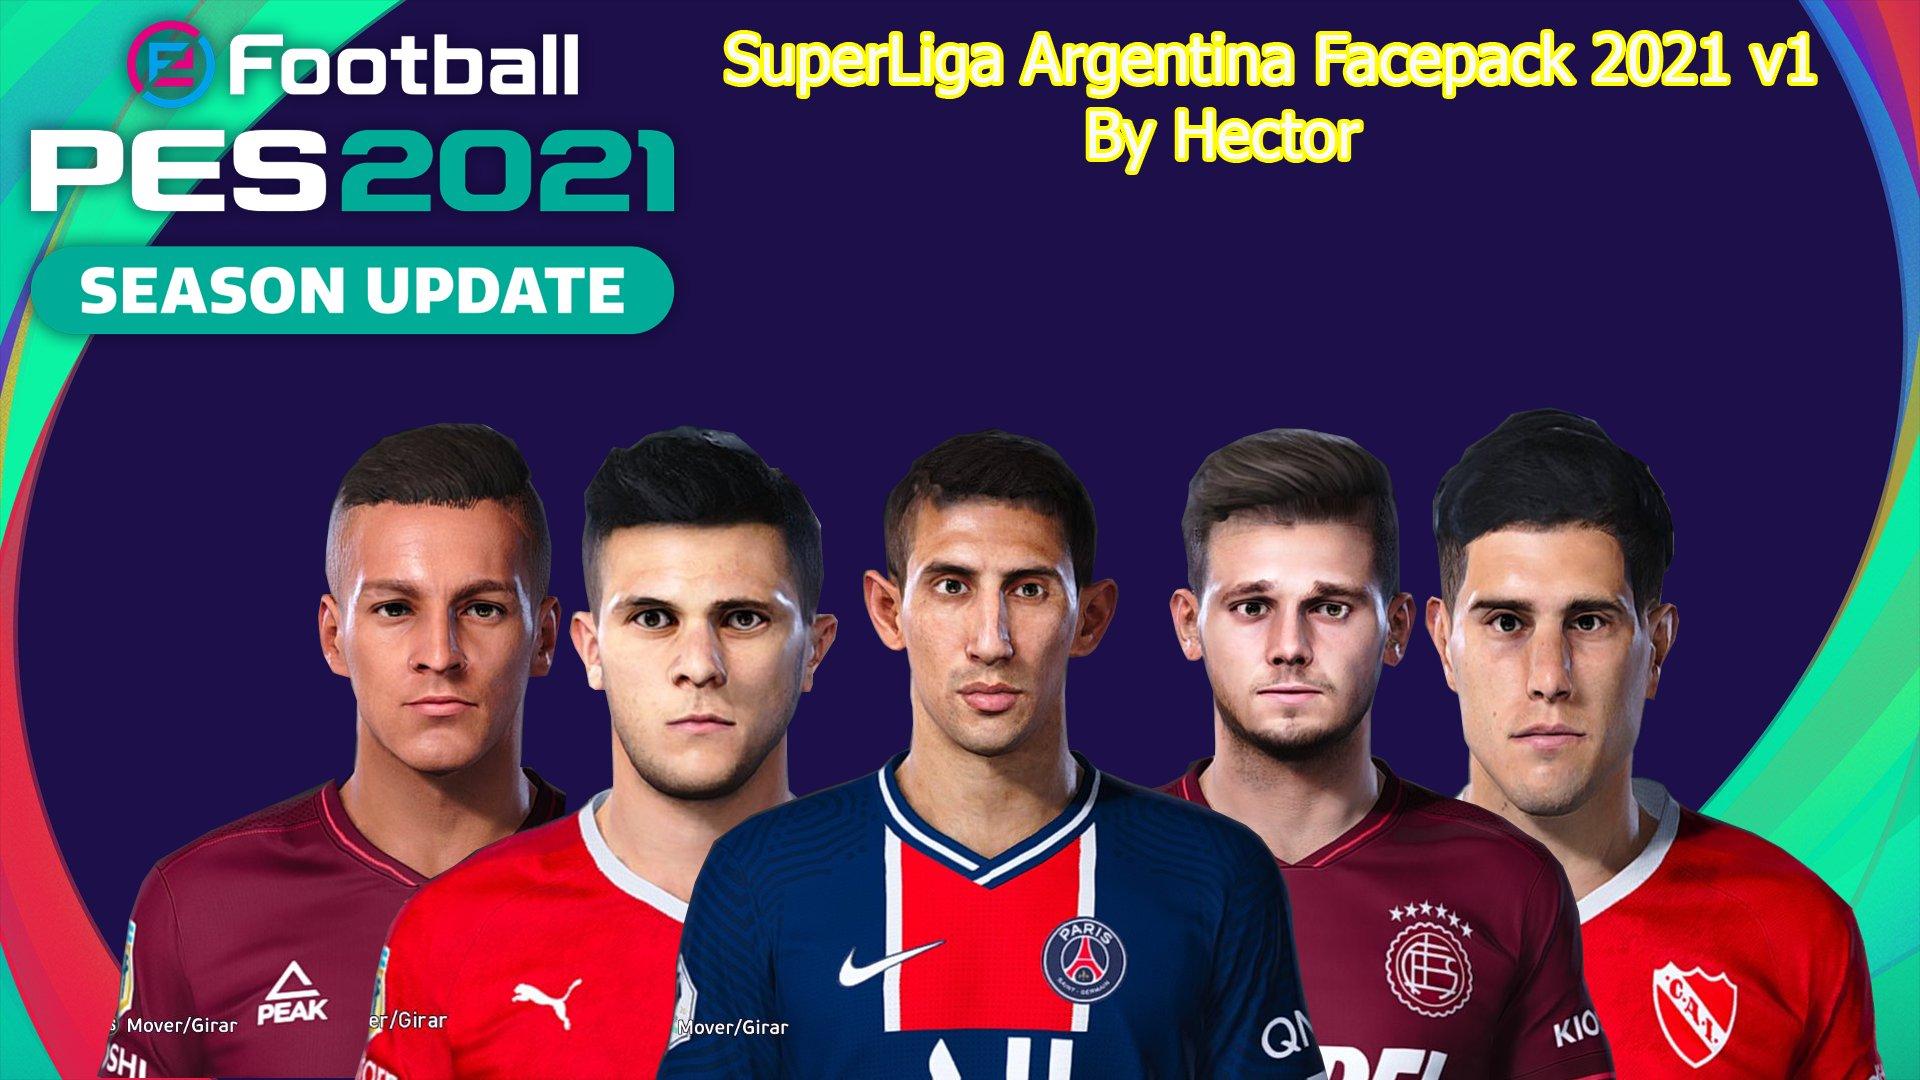 PES 2021 SuperLiga Argentina Facepack v1 by Hector